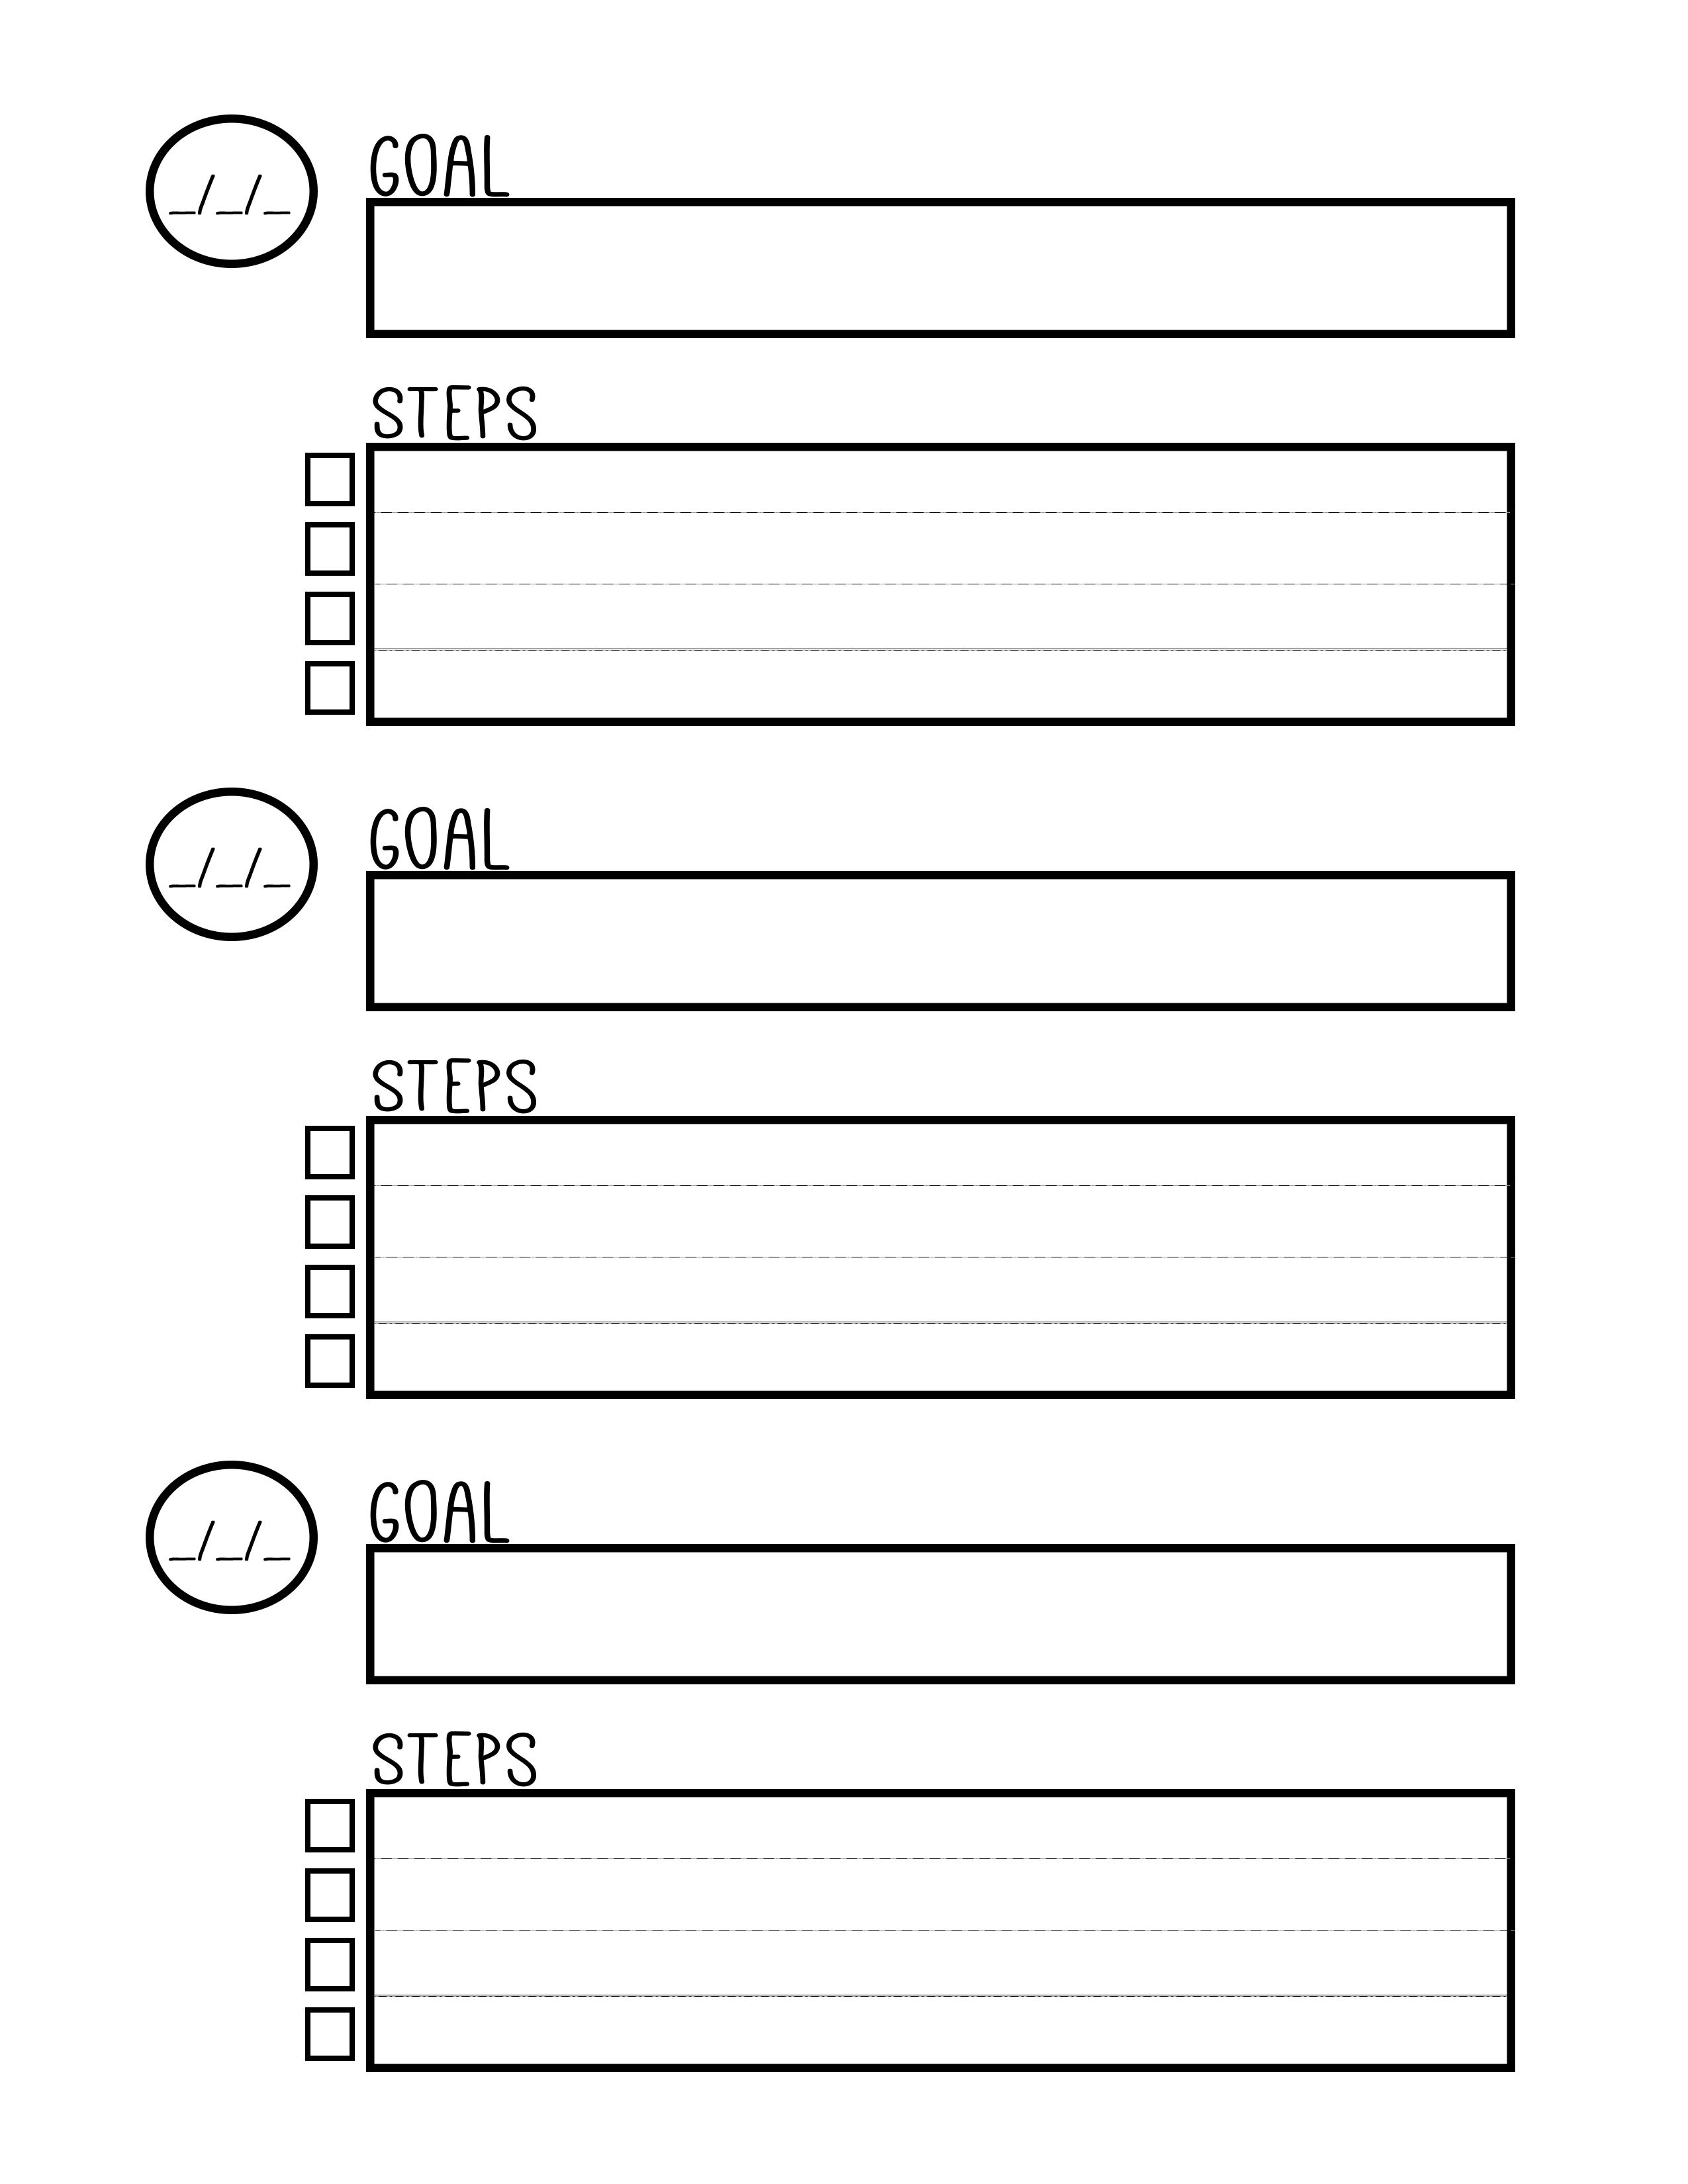 Free Printable Goal Setting Worksheet - Planner … | Education | Free Printable Goal Setting Worksheets For Students